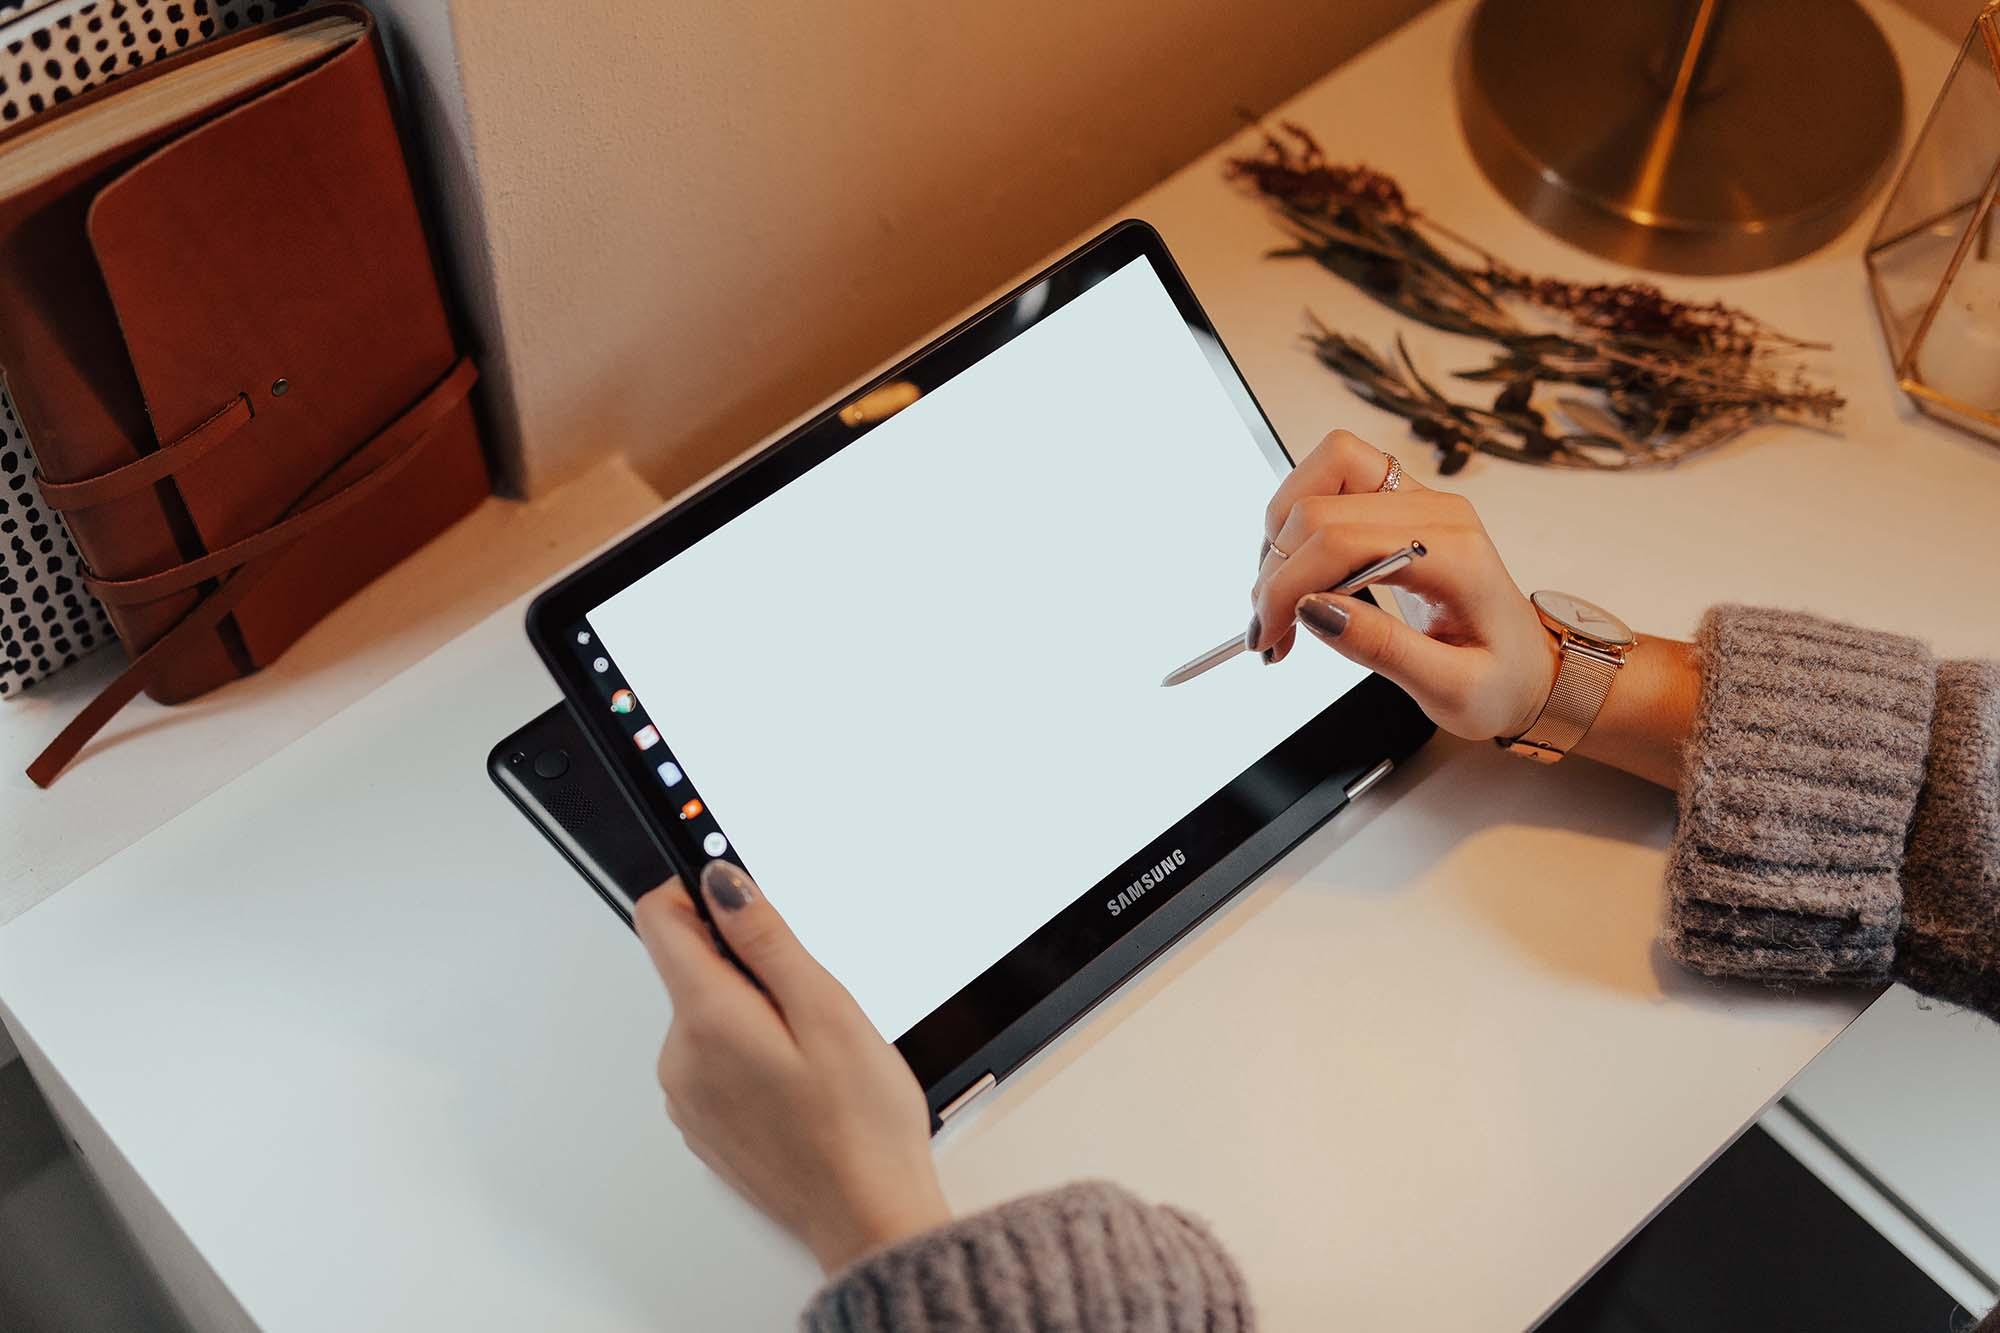 Samsung Tablet Mockup 2